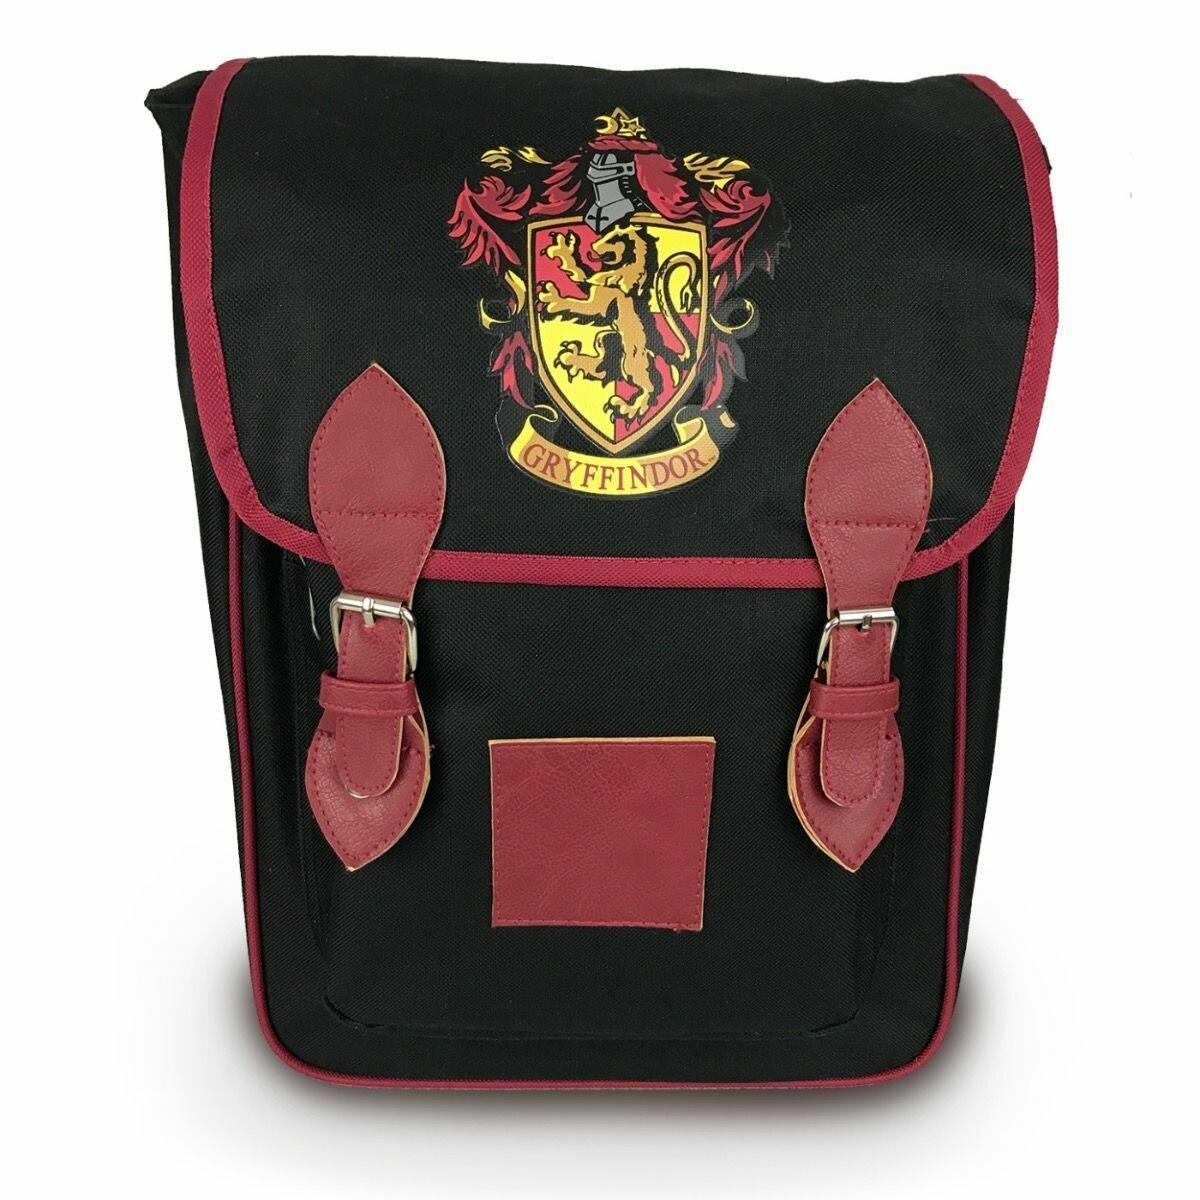 Bolsa Mochila Gryffindor Harry Potter